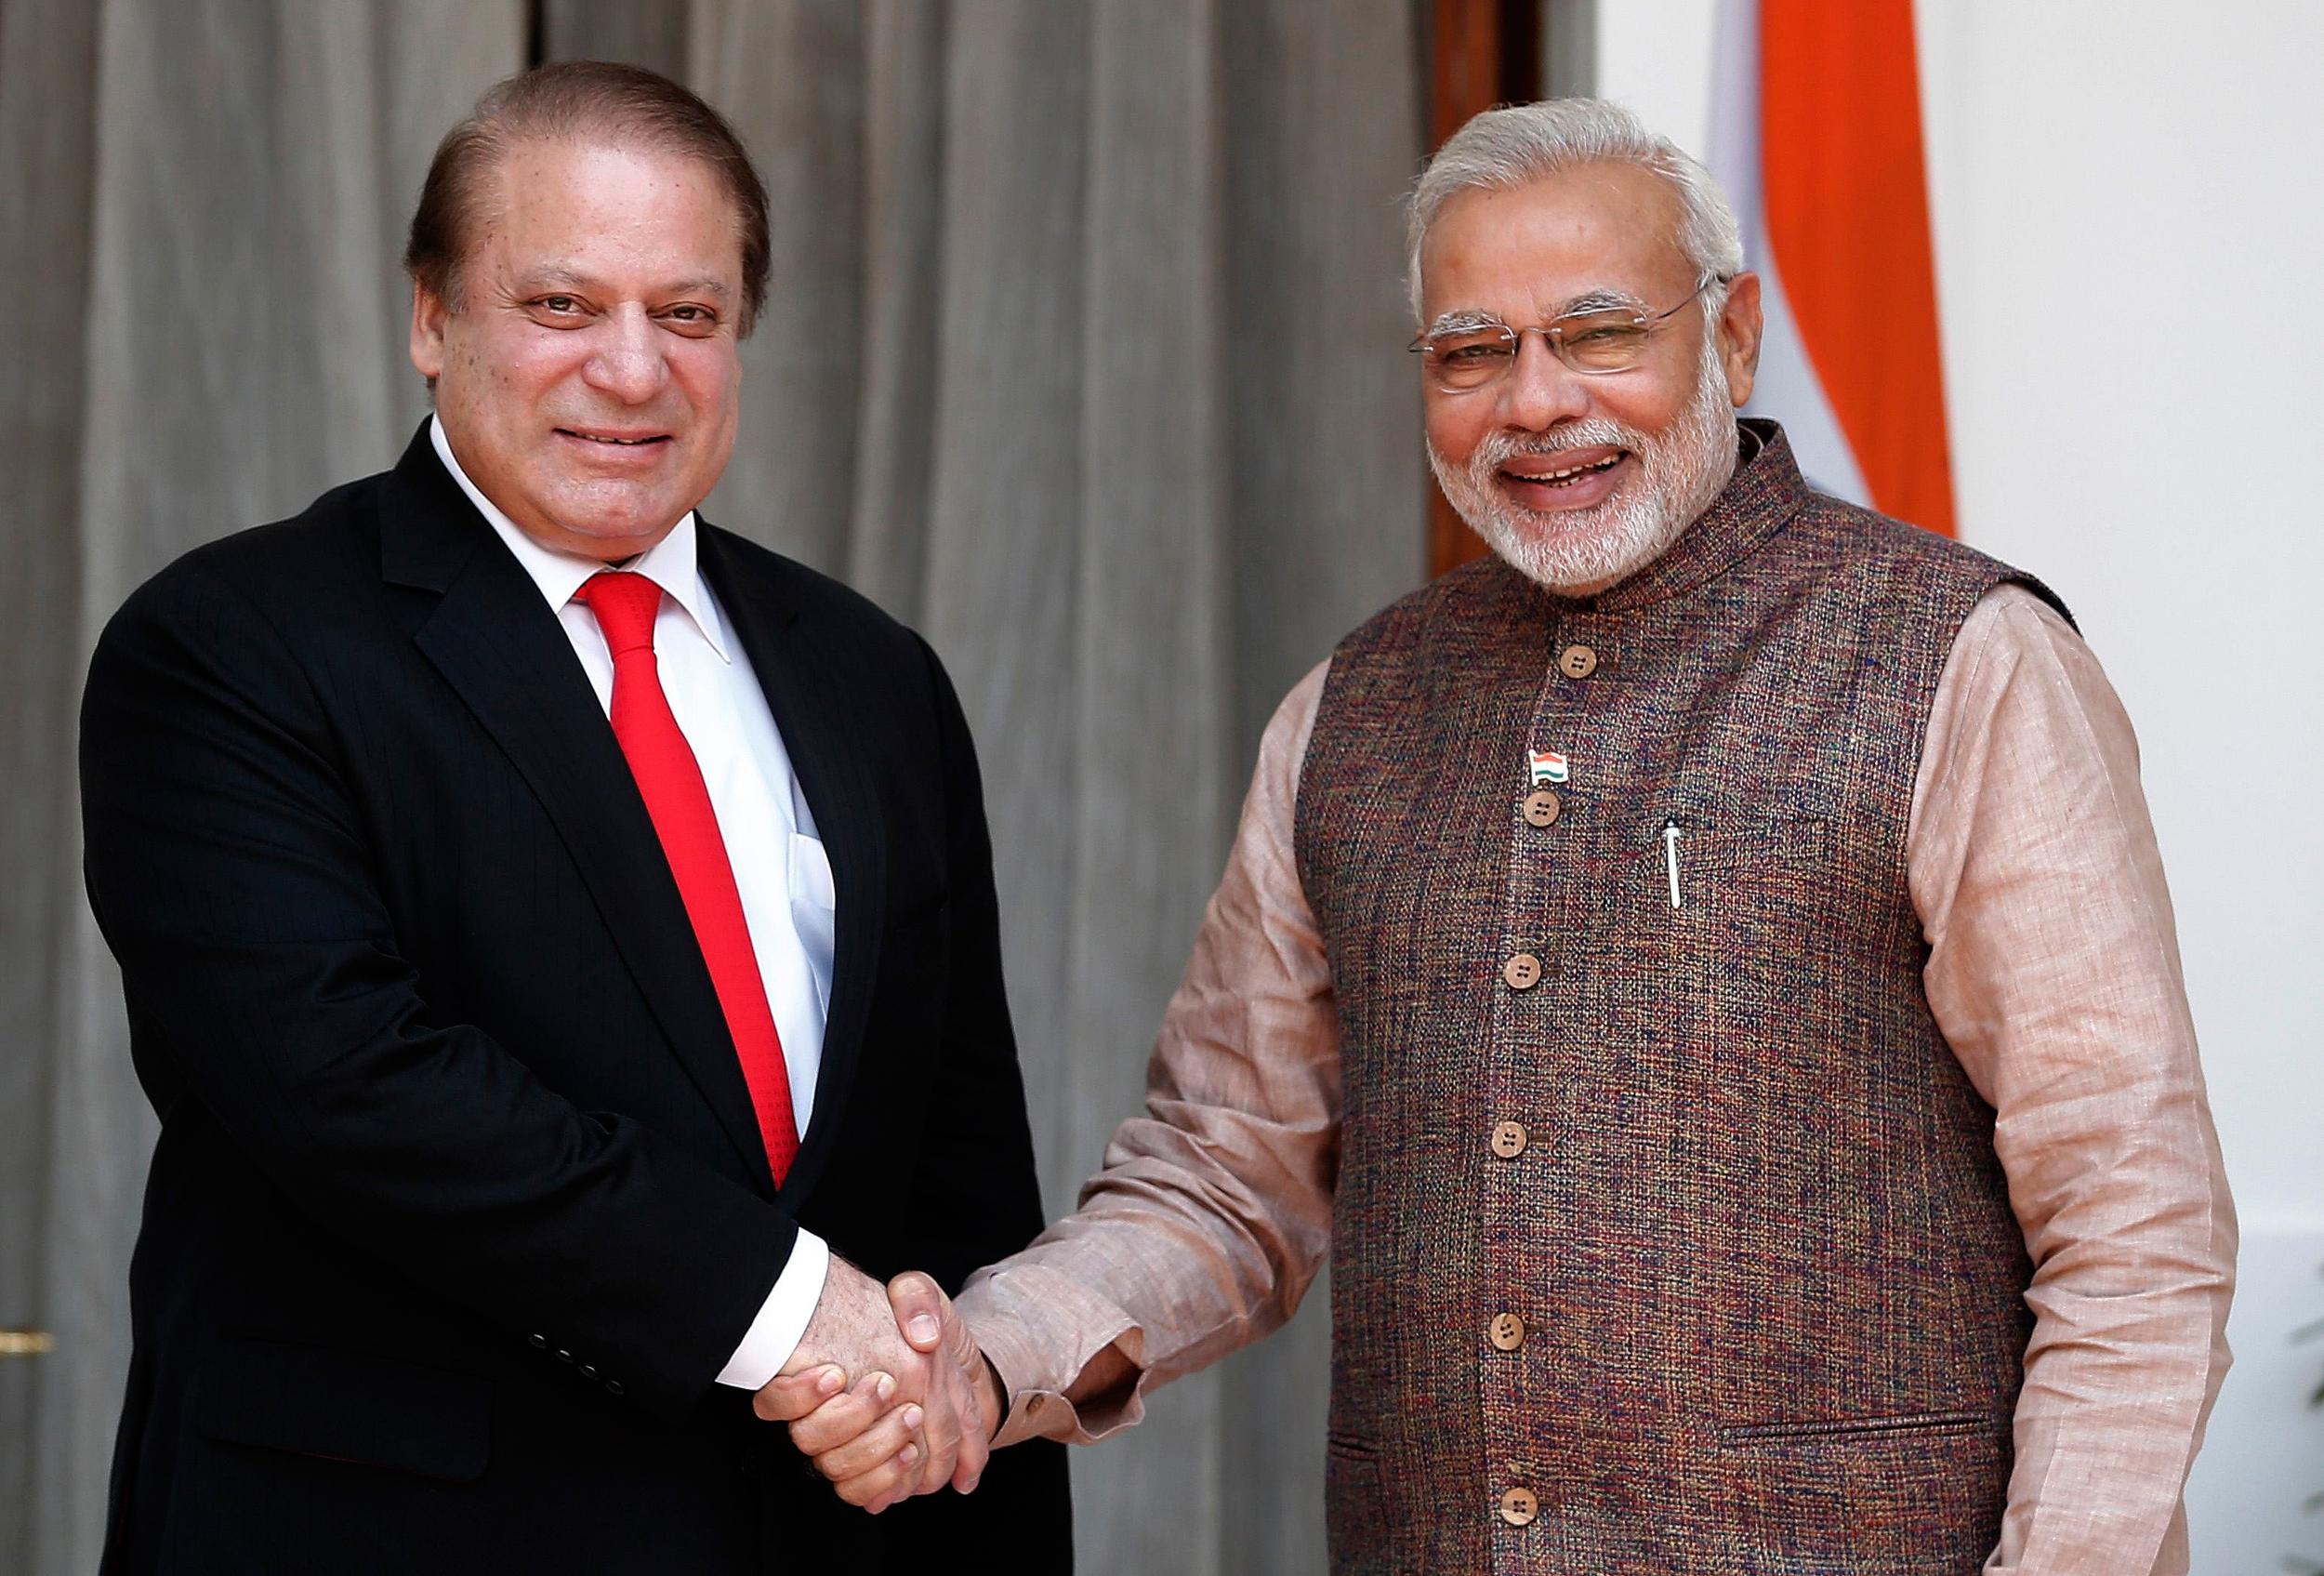 India's Controversial PM Narendra Modi to Dine at White House